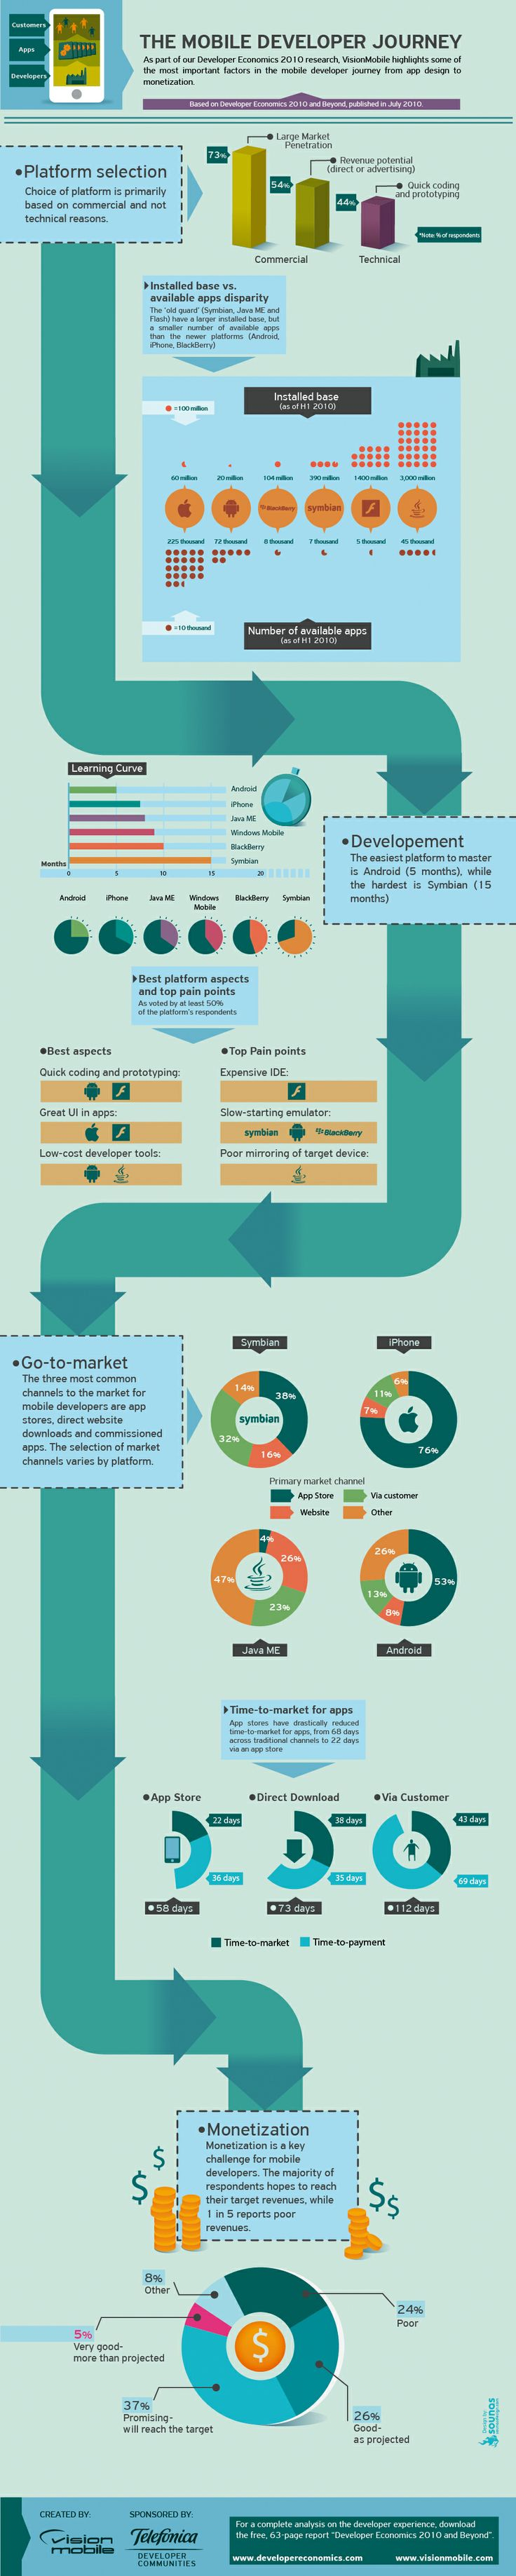 The Mobile Developer Journey #infographic